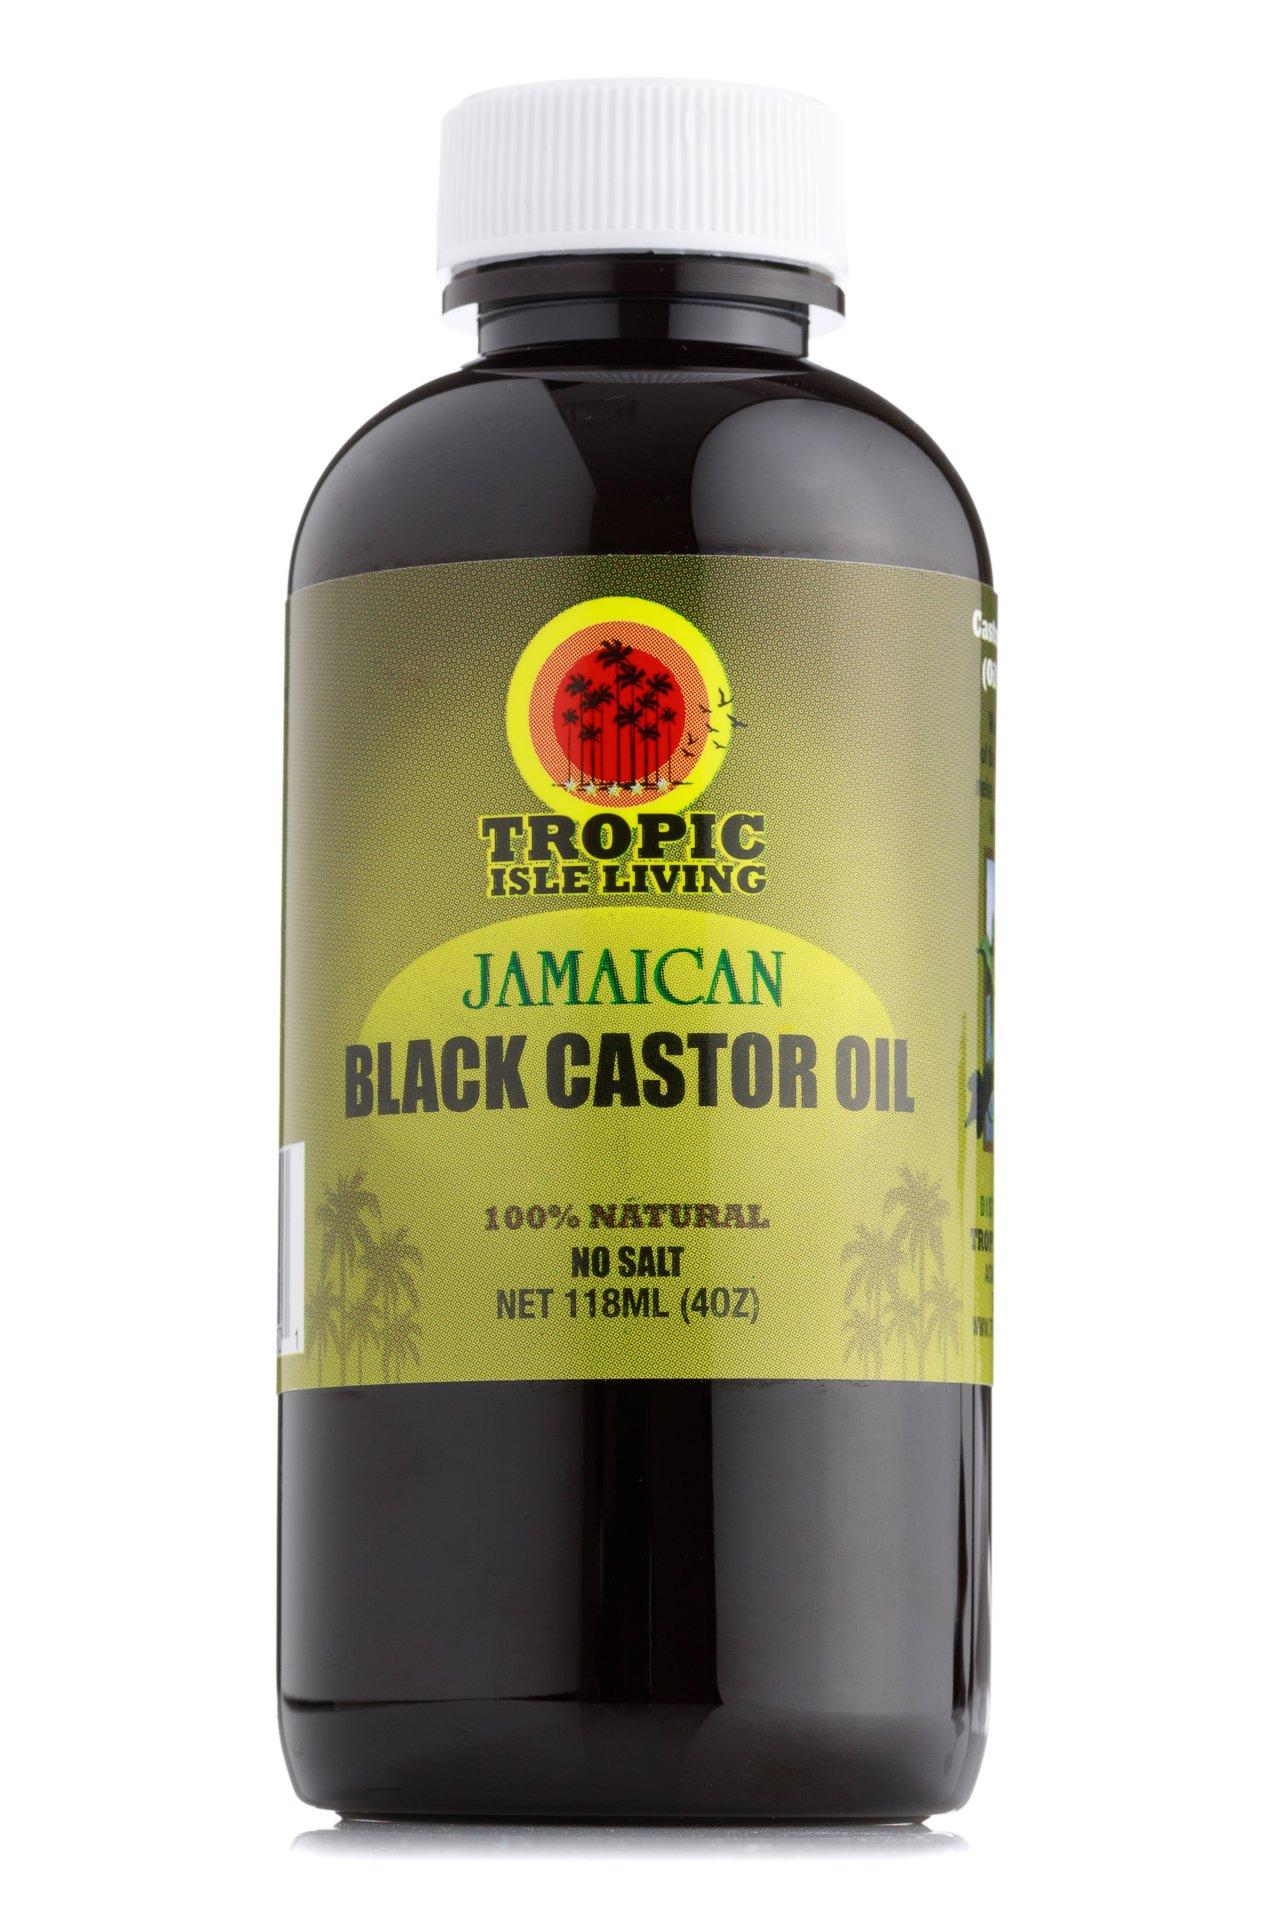 Tropic Isle Living Jamaican Black Castor Oil (4oz)